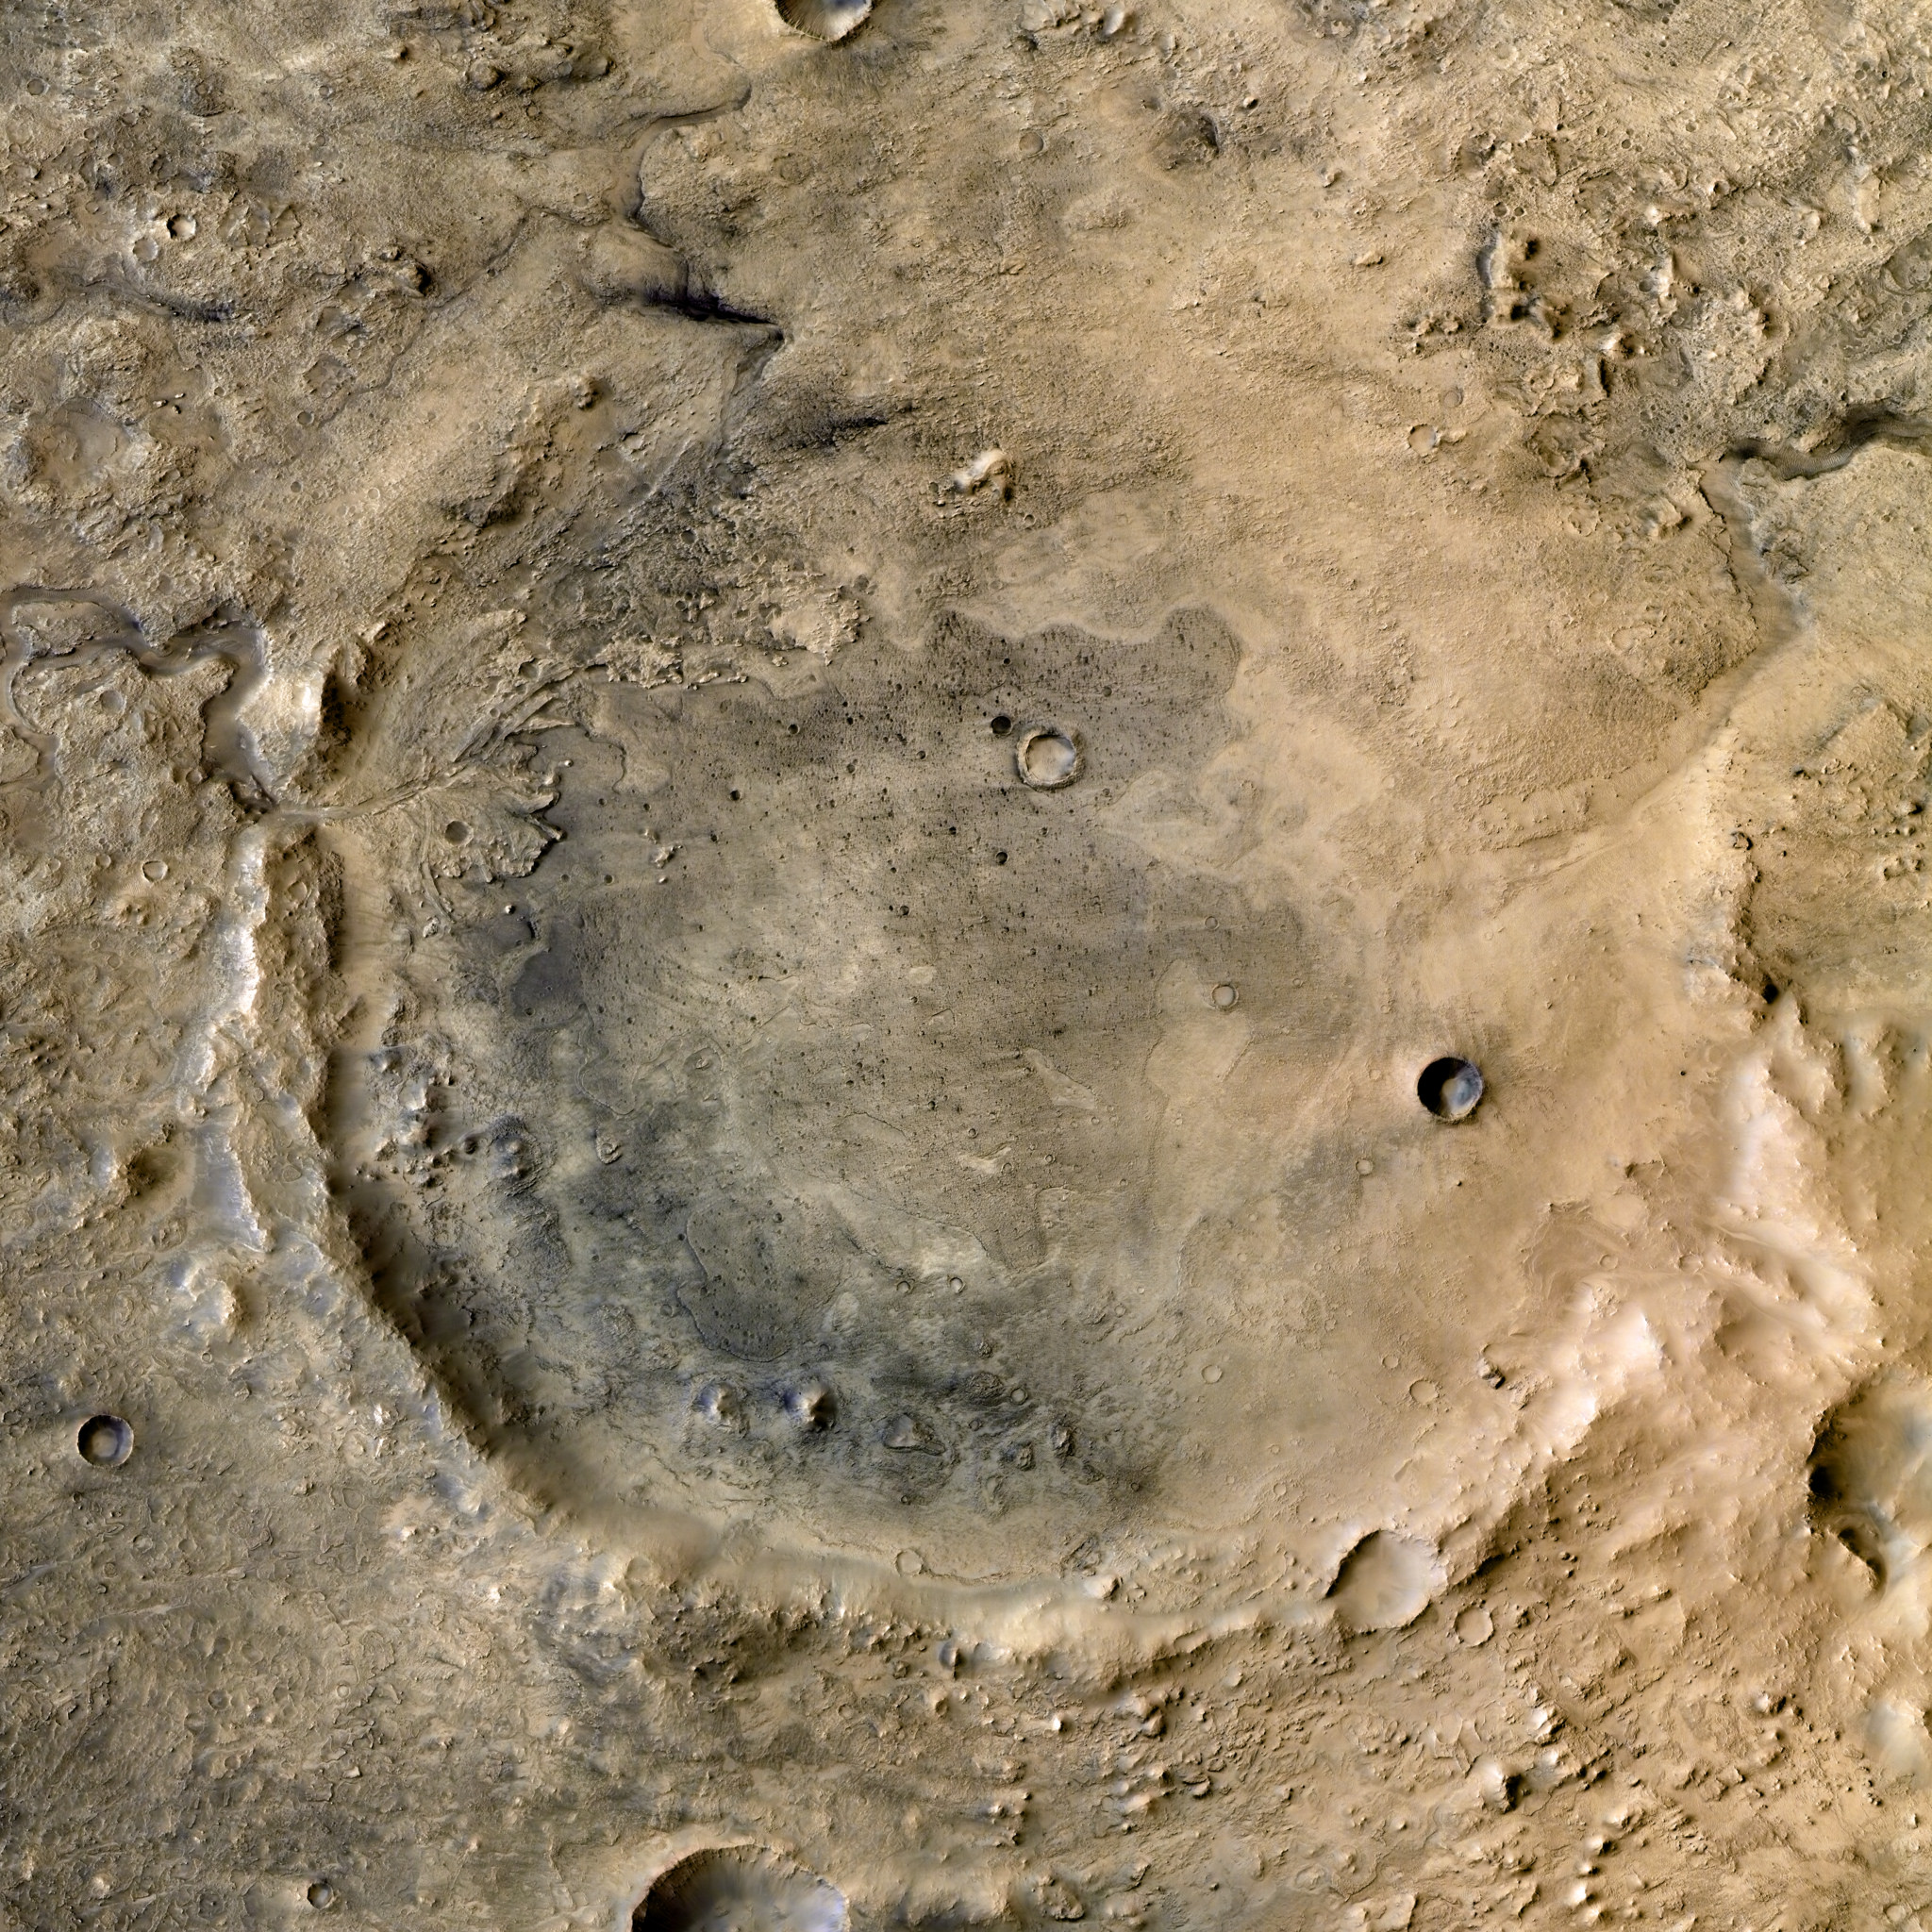 High-res view of Mars 2020 landing site: Jezero Crater – planetaria